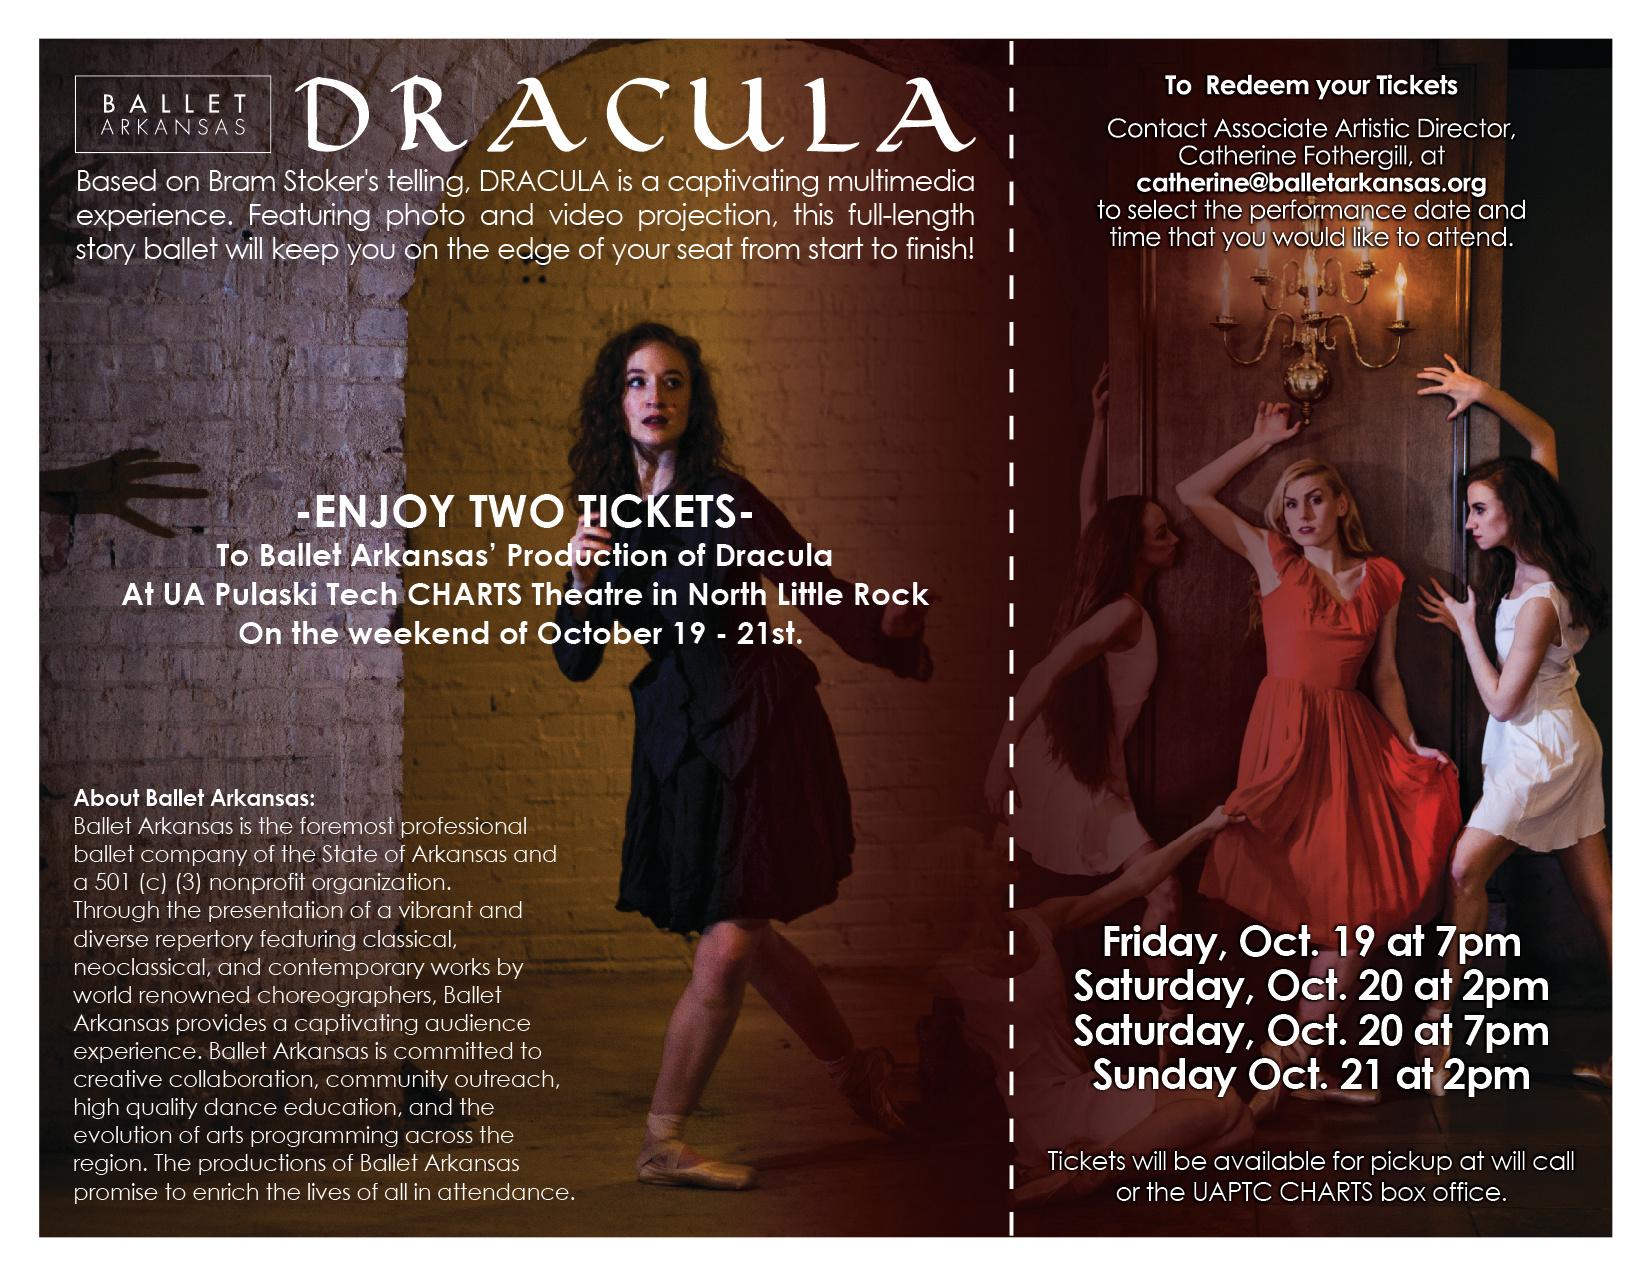 Dracula Donation Certificate